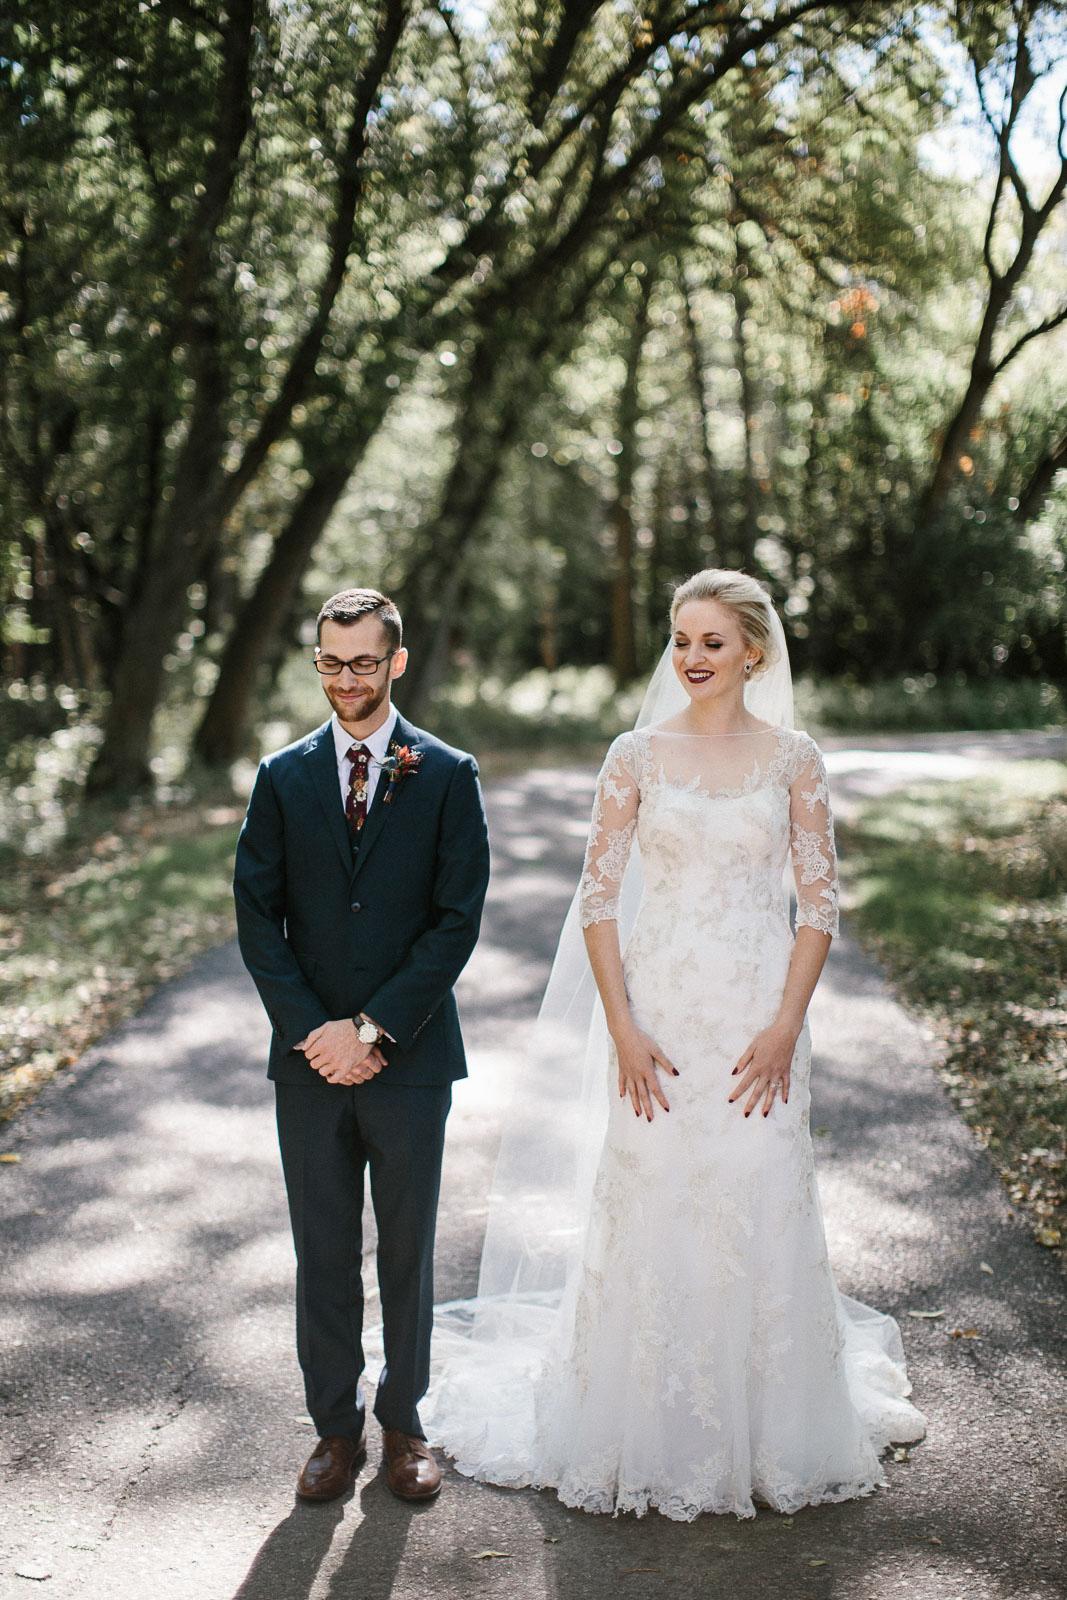 Jenna&Austin_SiouxFalls_Wedding_Photographer_033.jpg